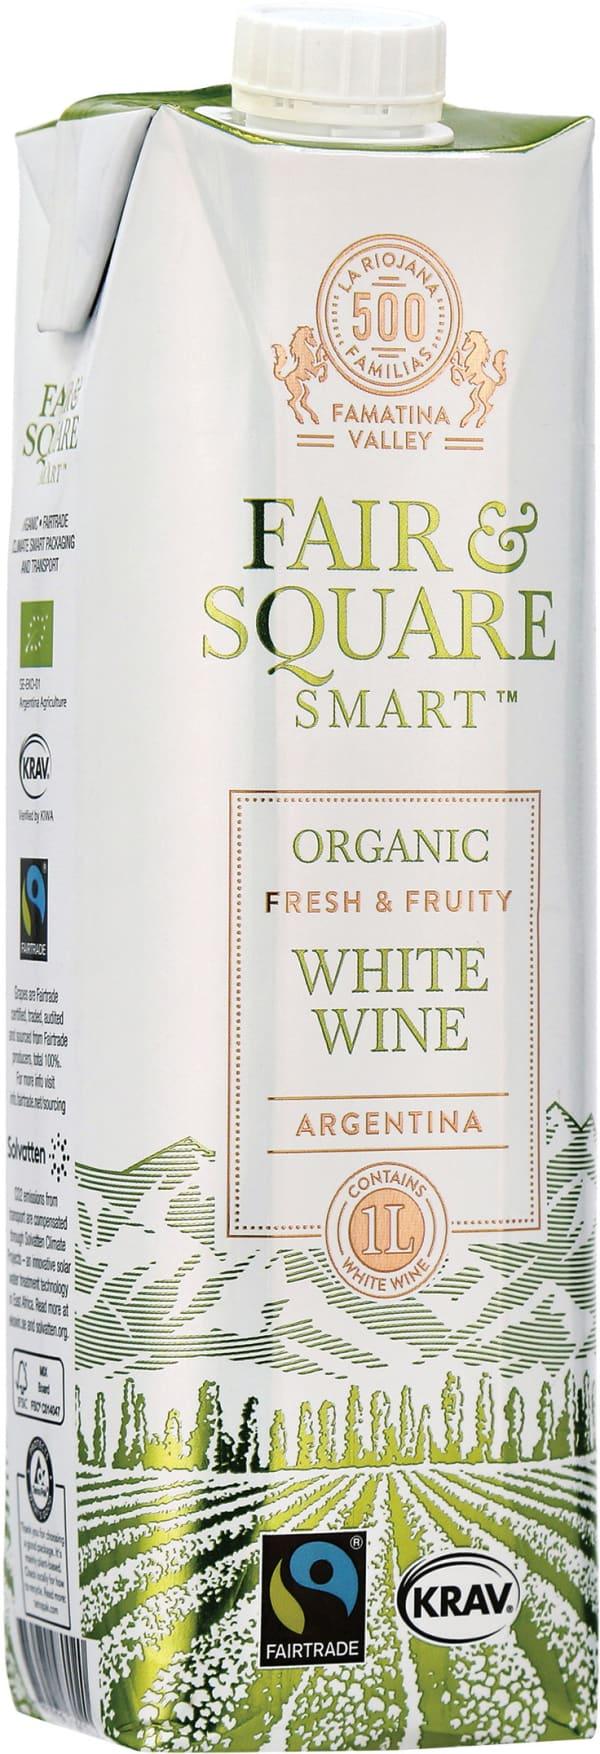 Fair & Square White 2020 kartongförpackning